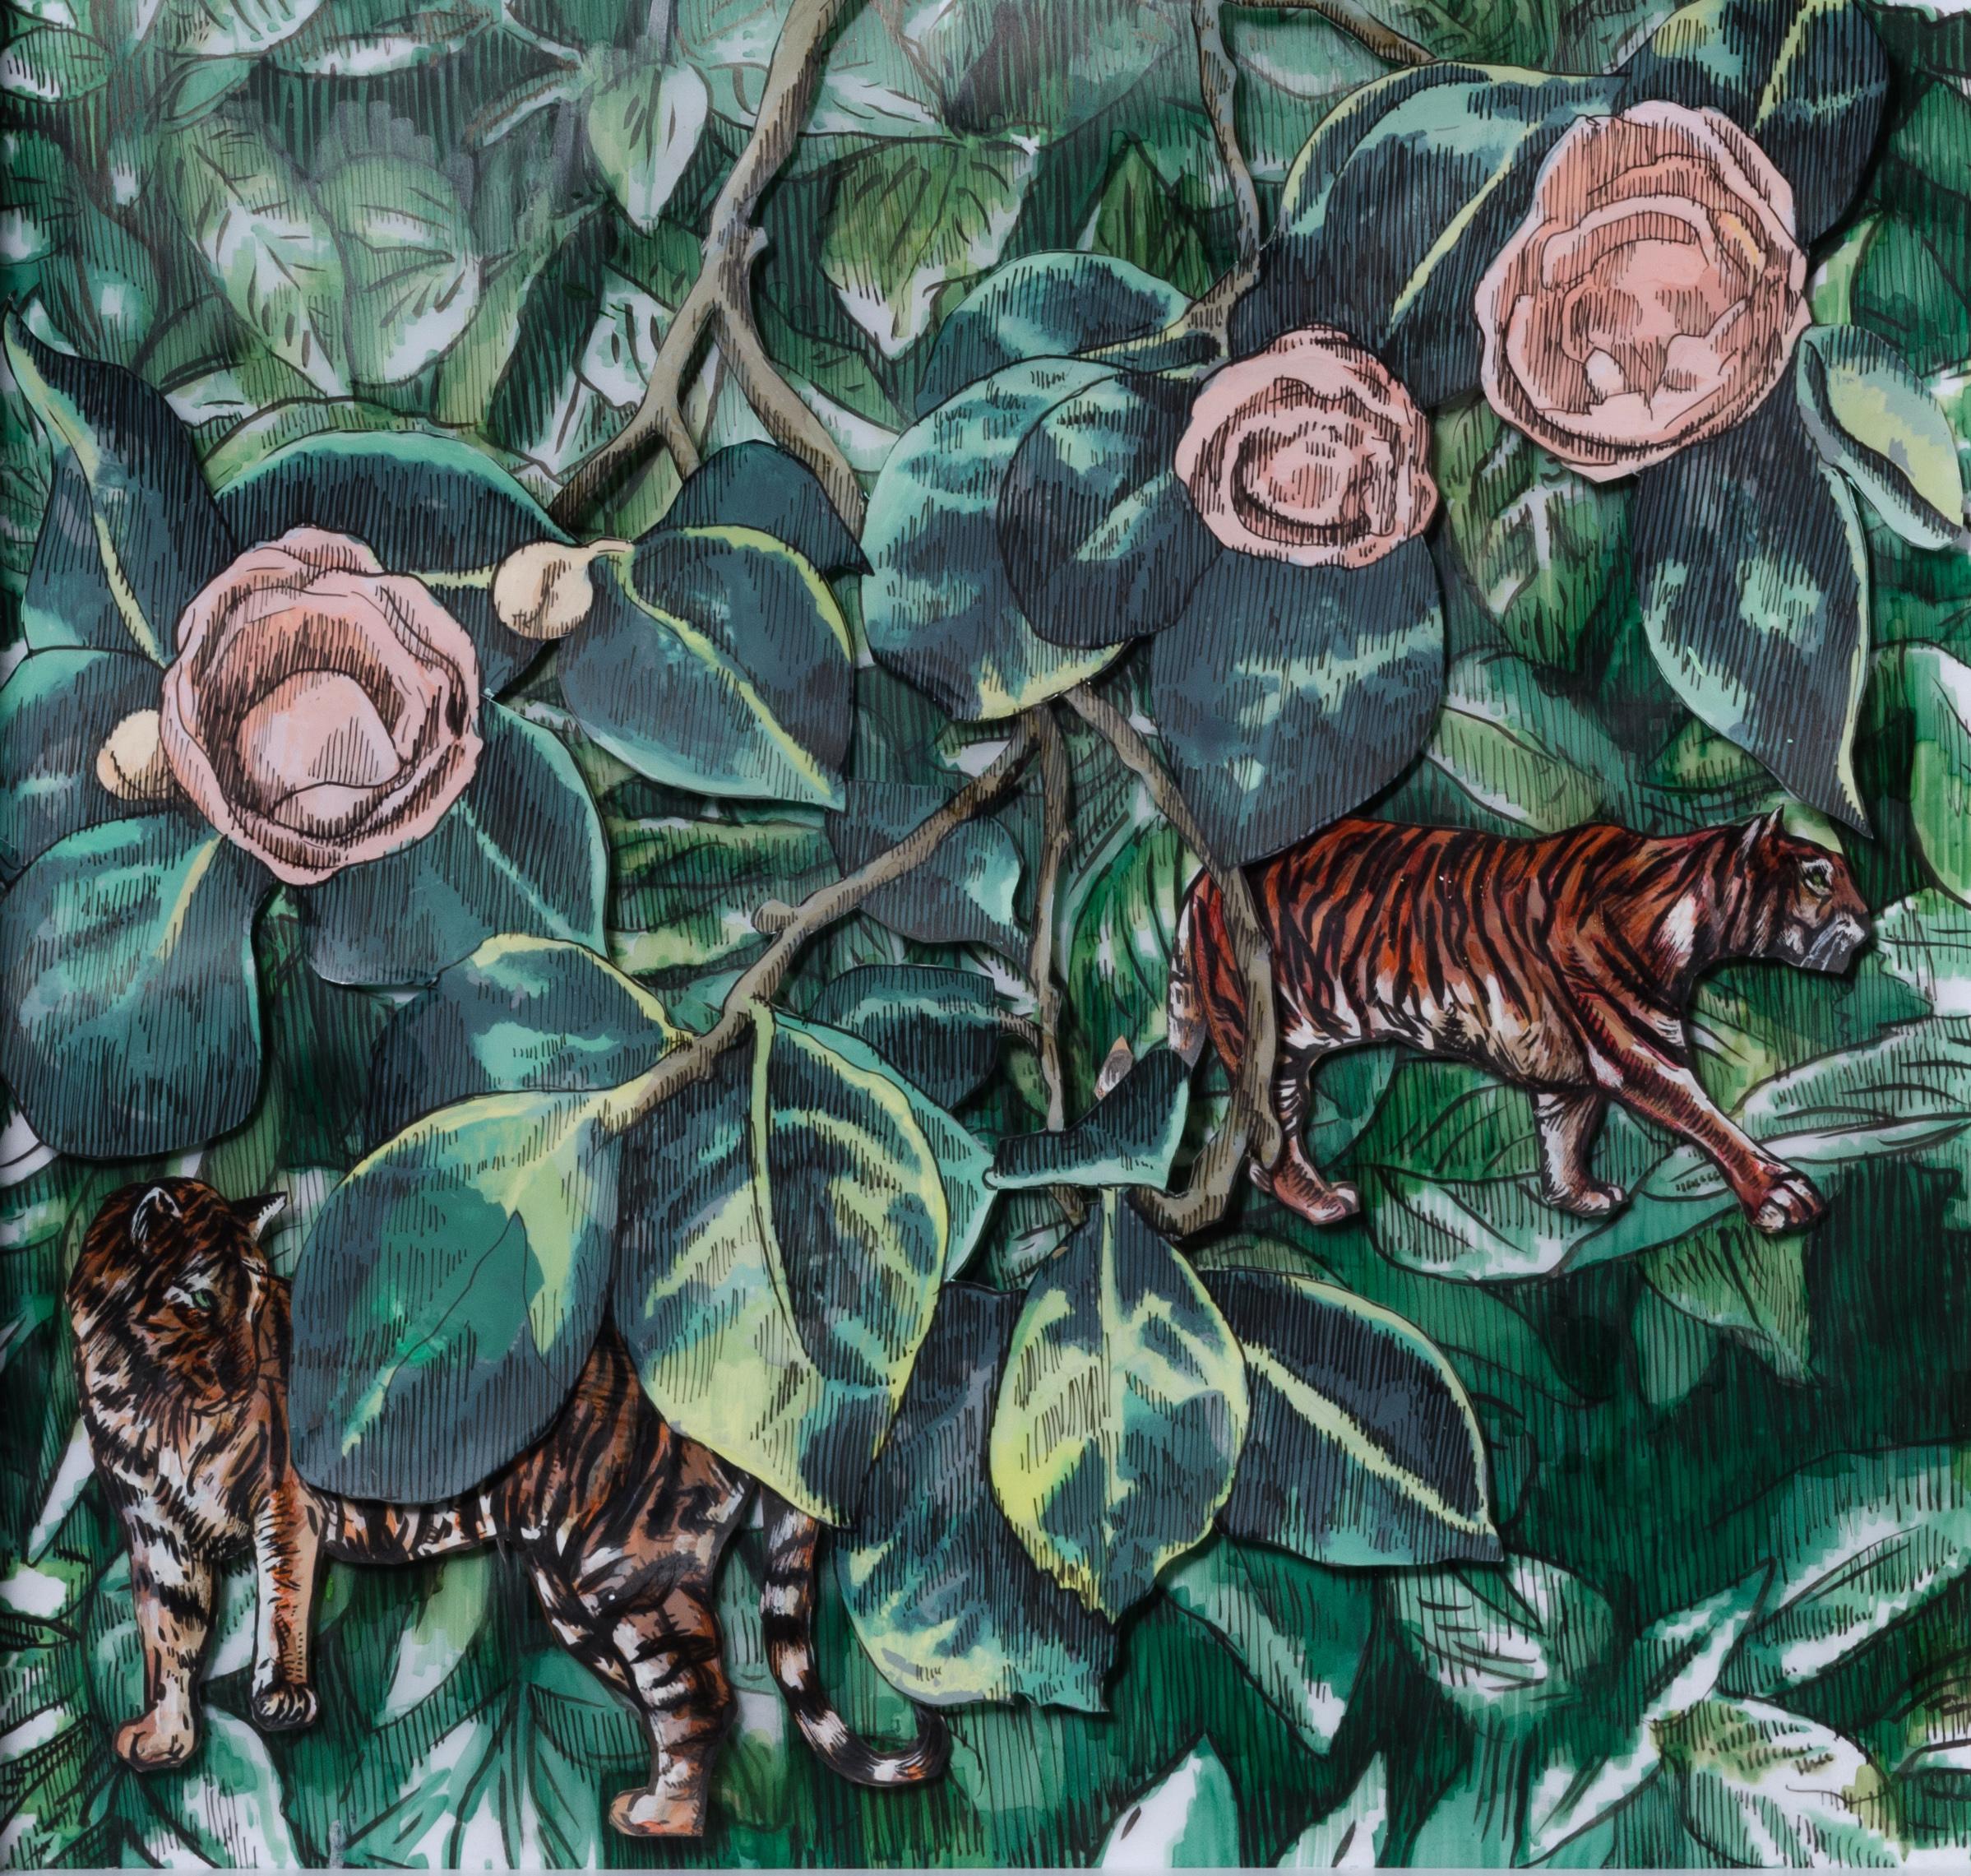 Tigris Botanica